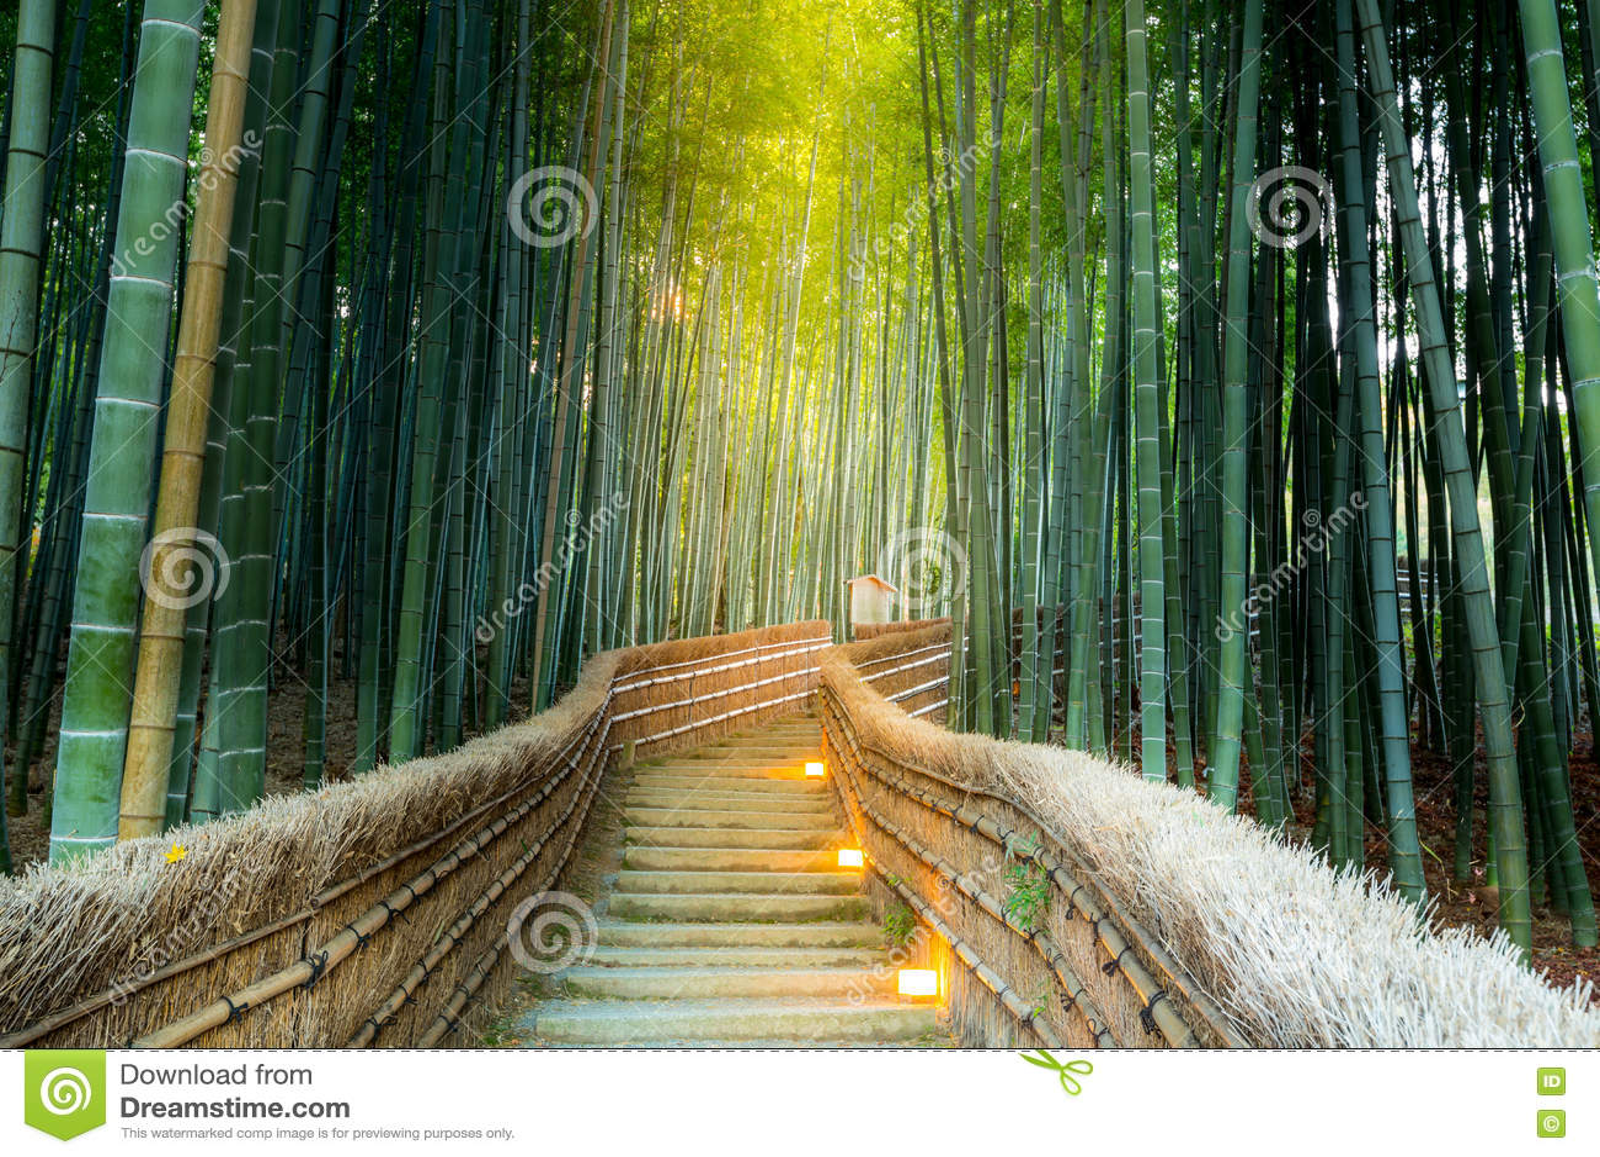 Arashiyama Bambuswald Stockfoto Bild Von Uberraschen 76034762